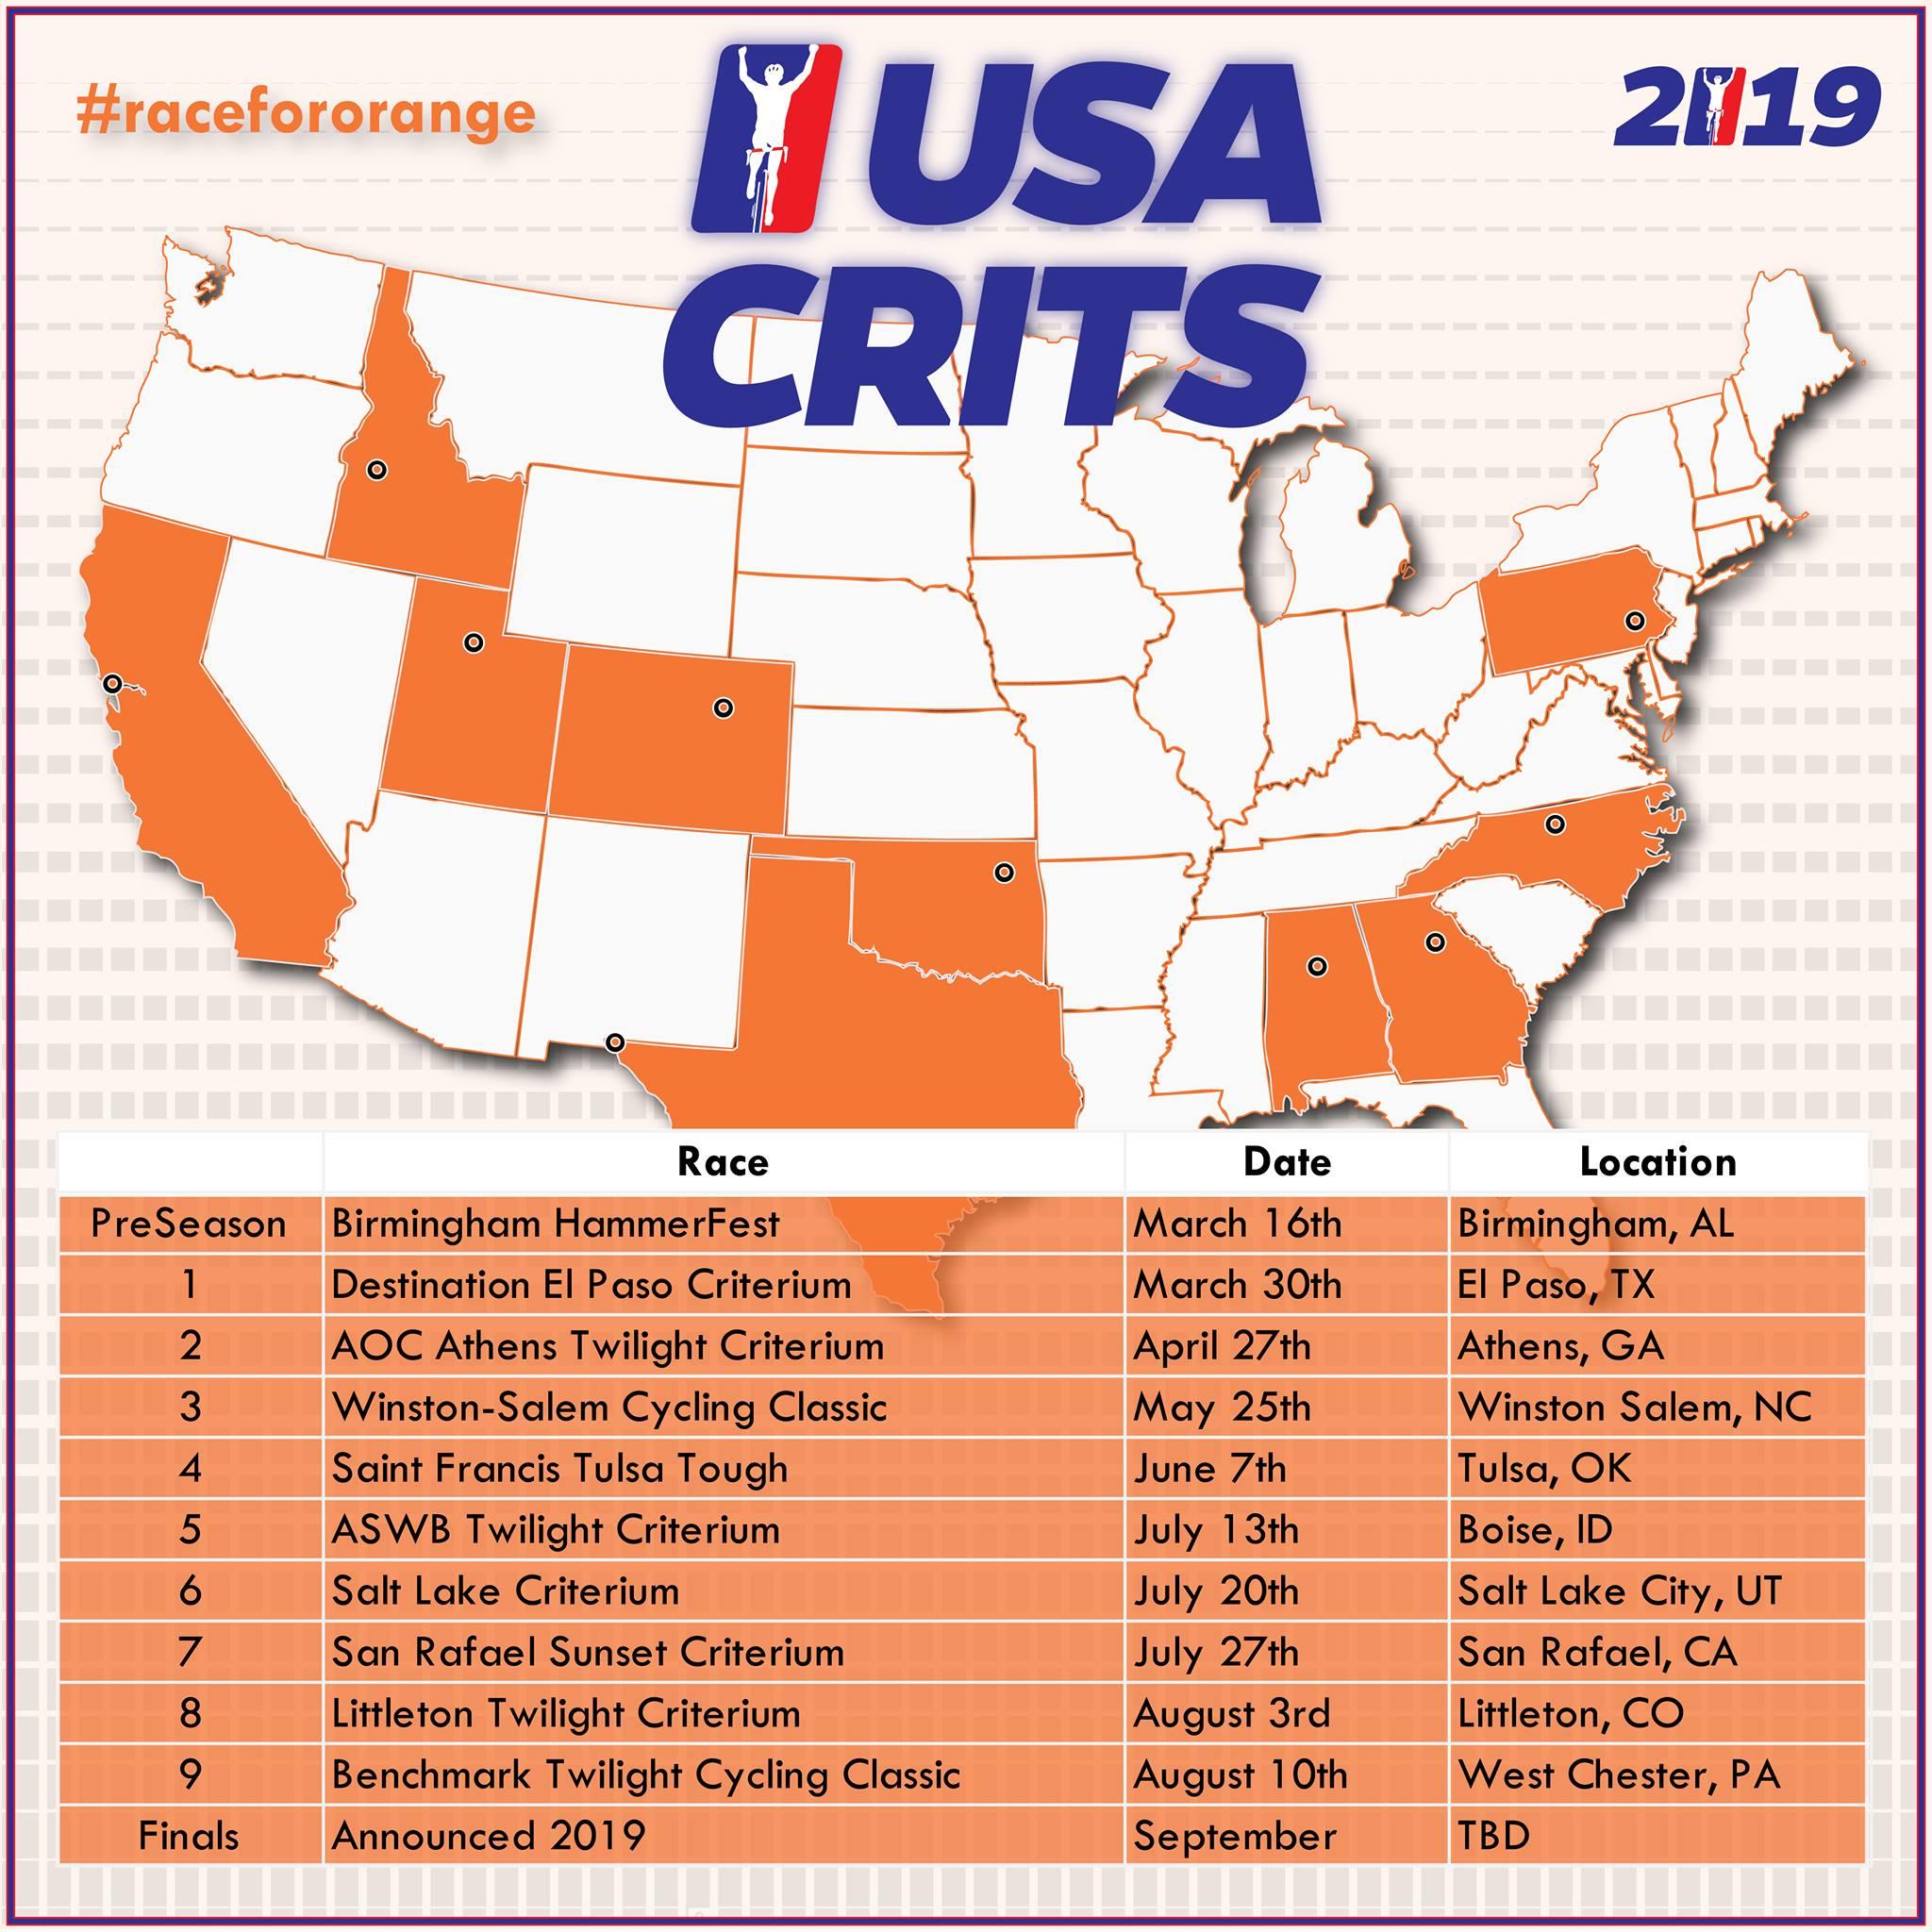 USA Crits Map 1